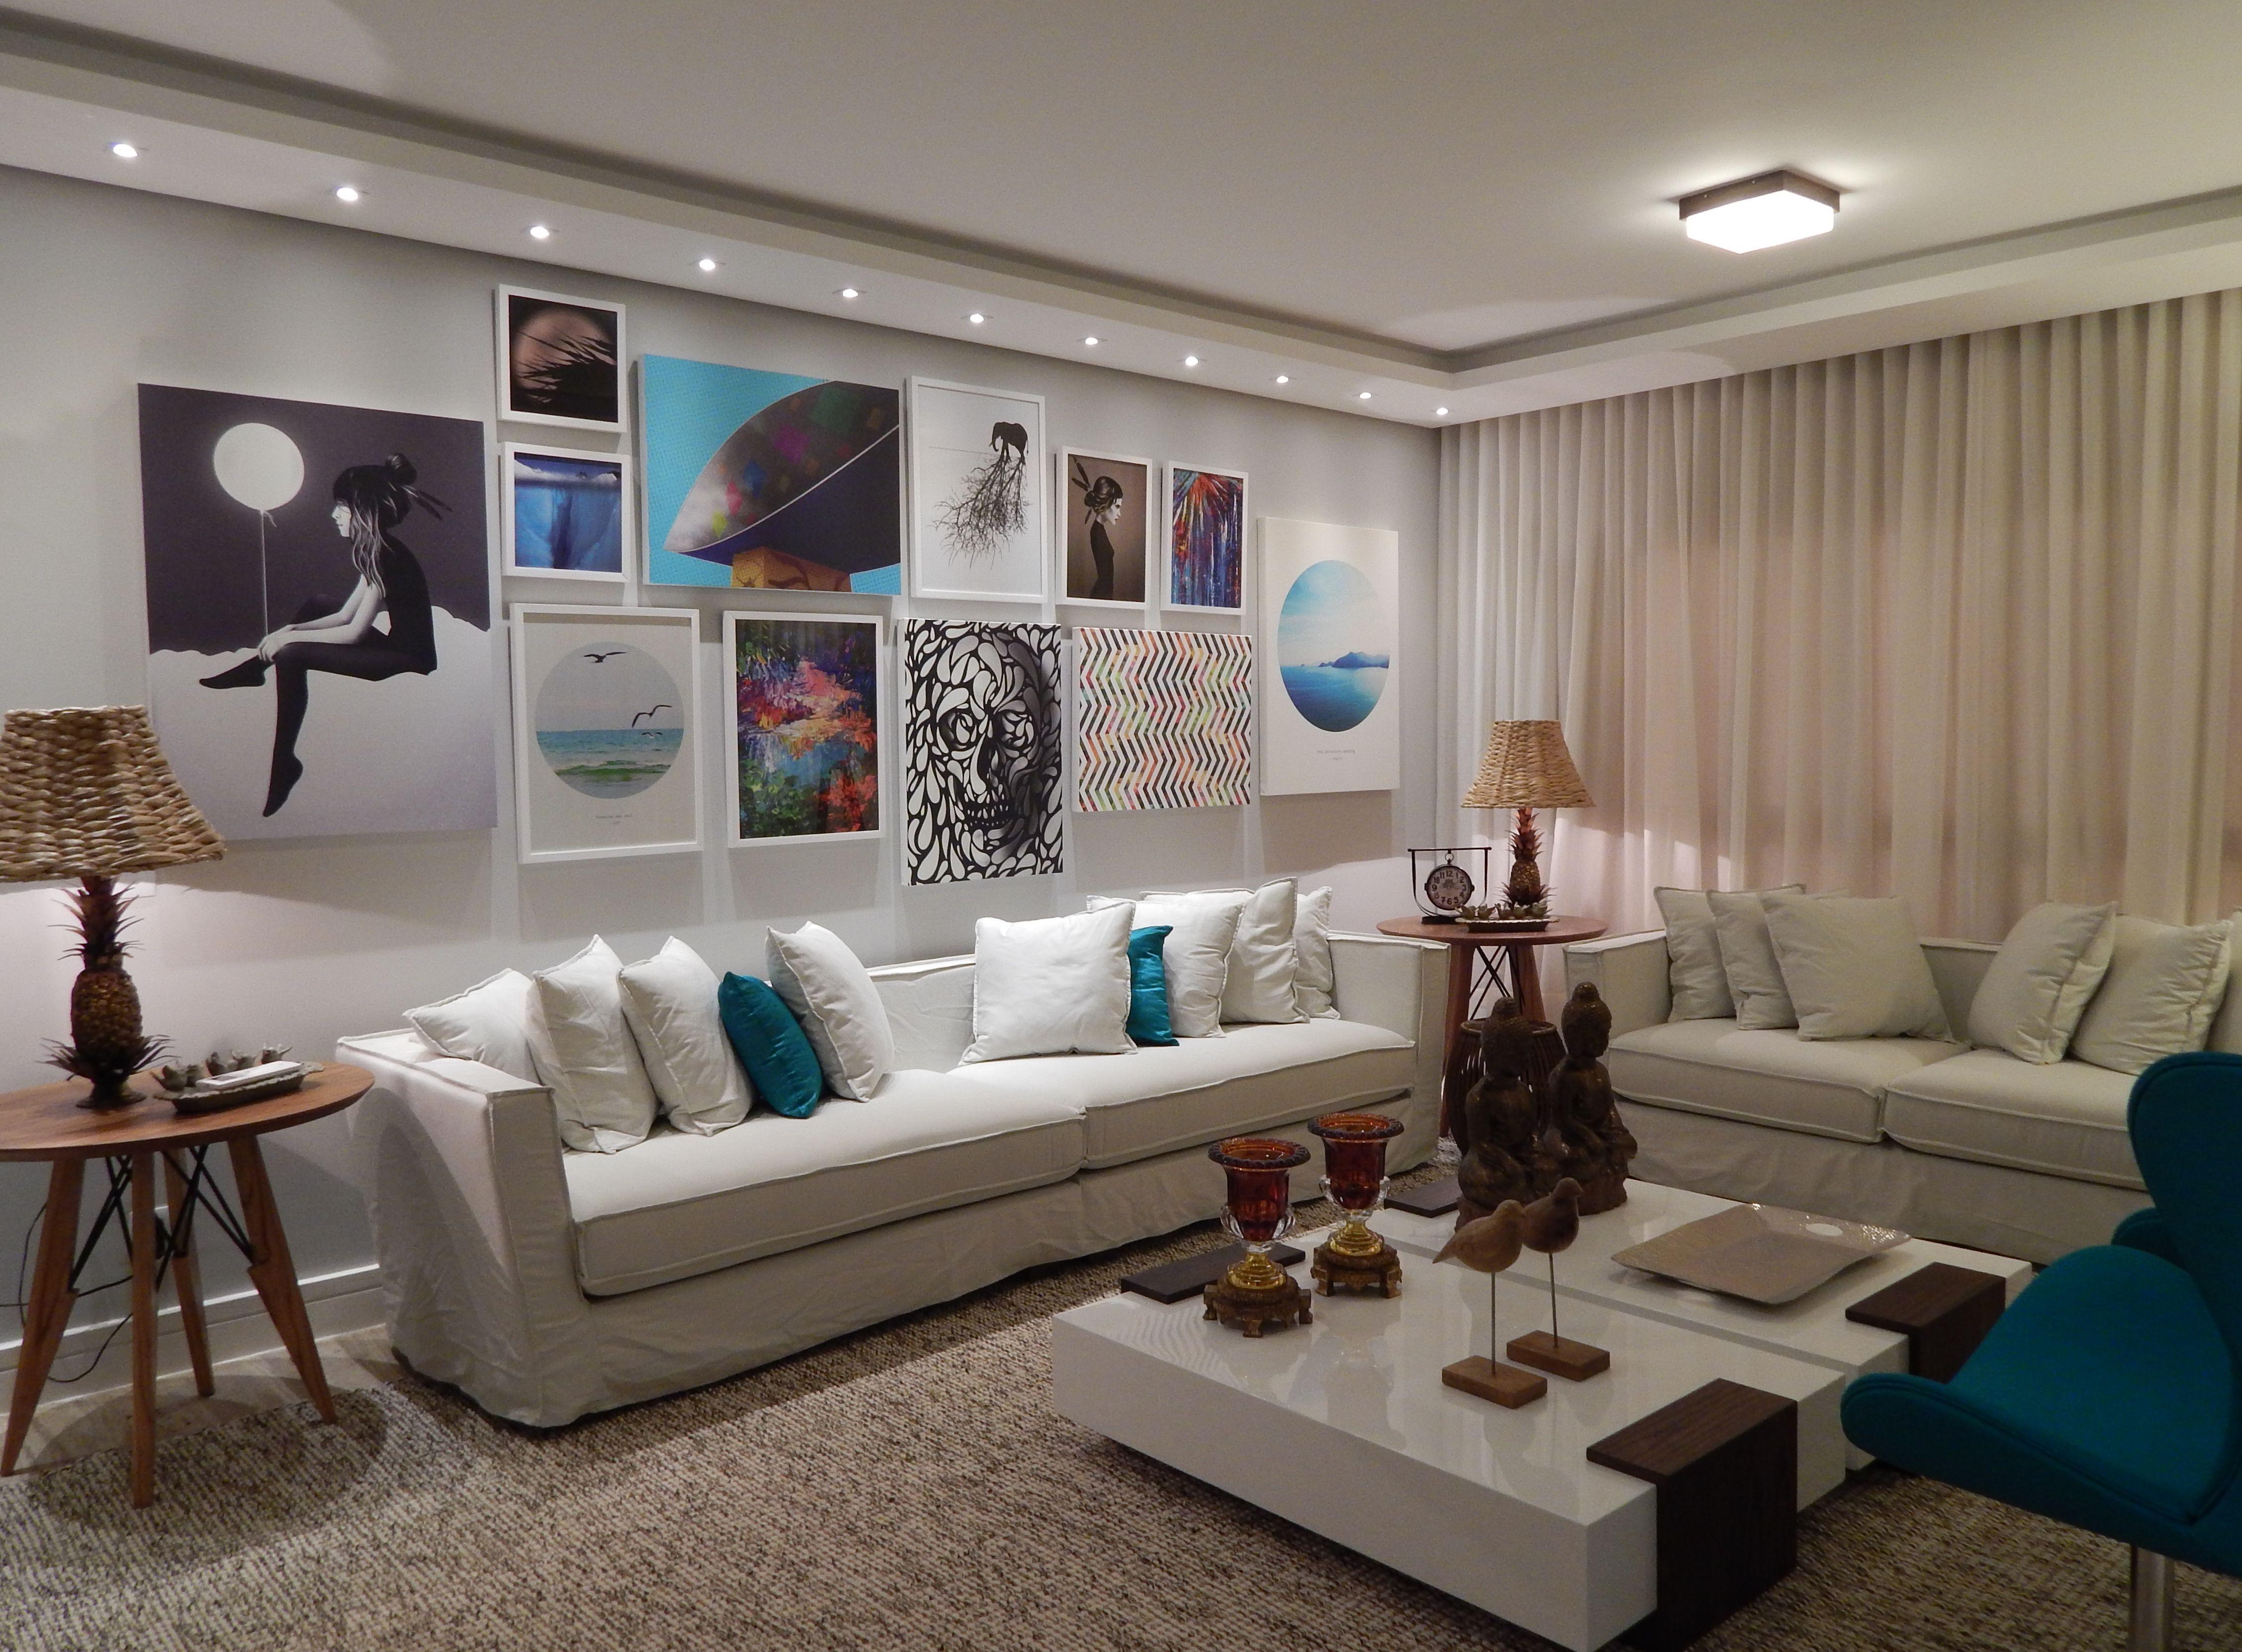 Sala de estar 2014 arquiteta barbara panassi azul for Cortinas azul turquesa